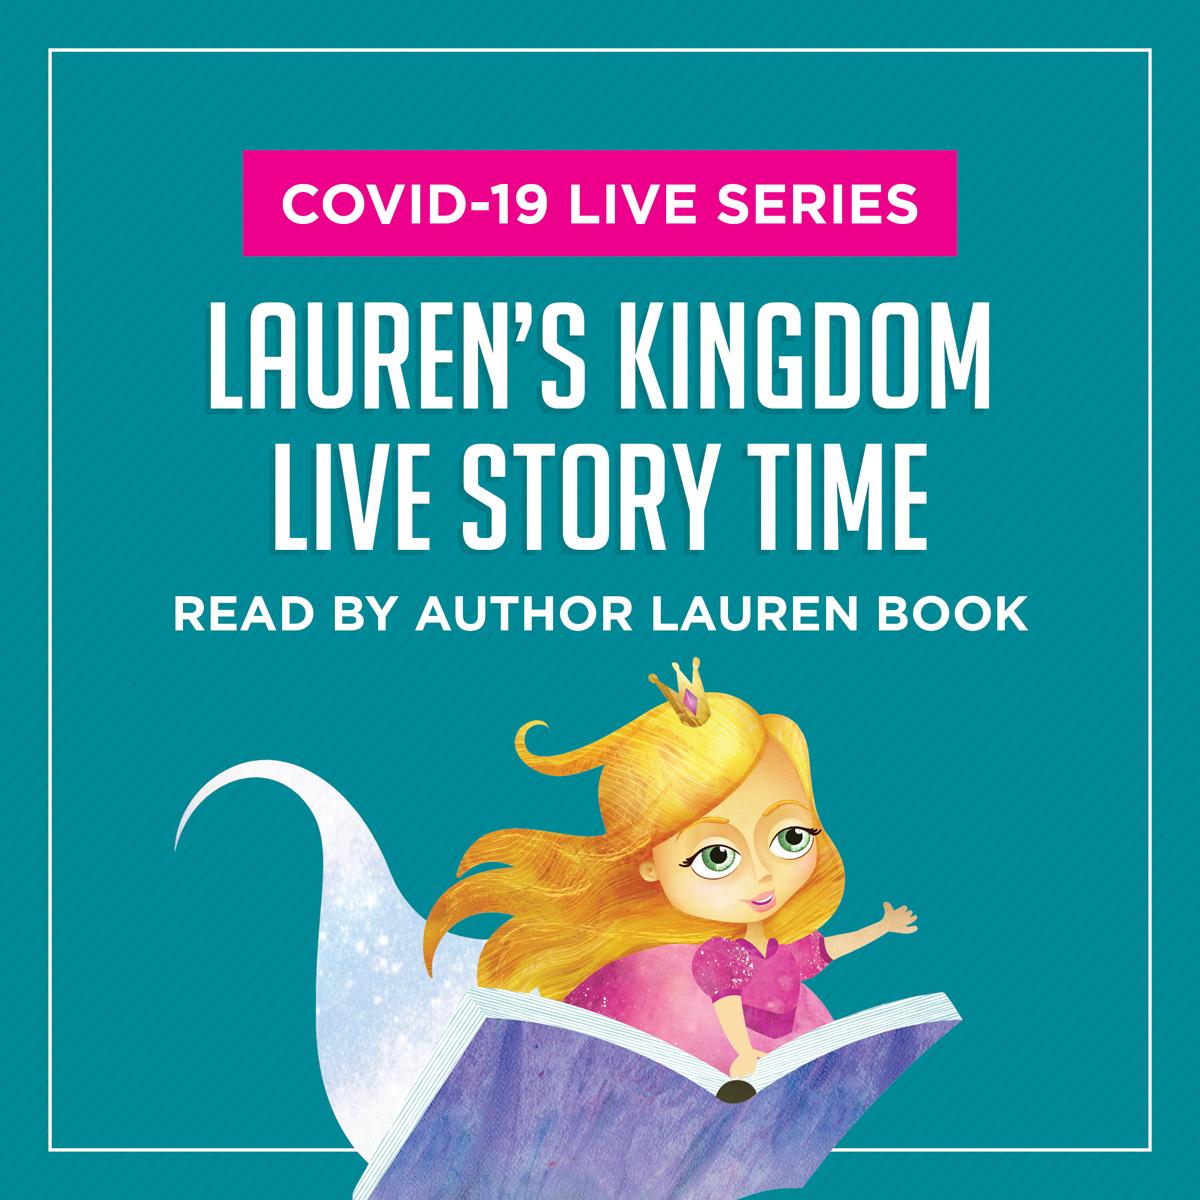 COVID-19 LIVE SERIES / Lauren's Kingdom Live Story Time / Read by author Lauren Book